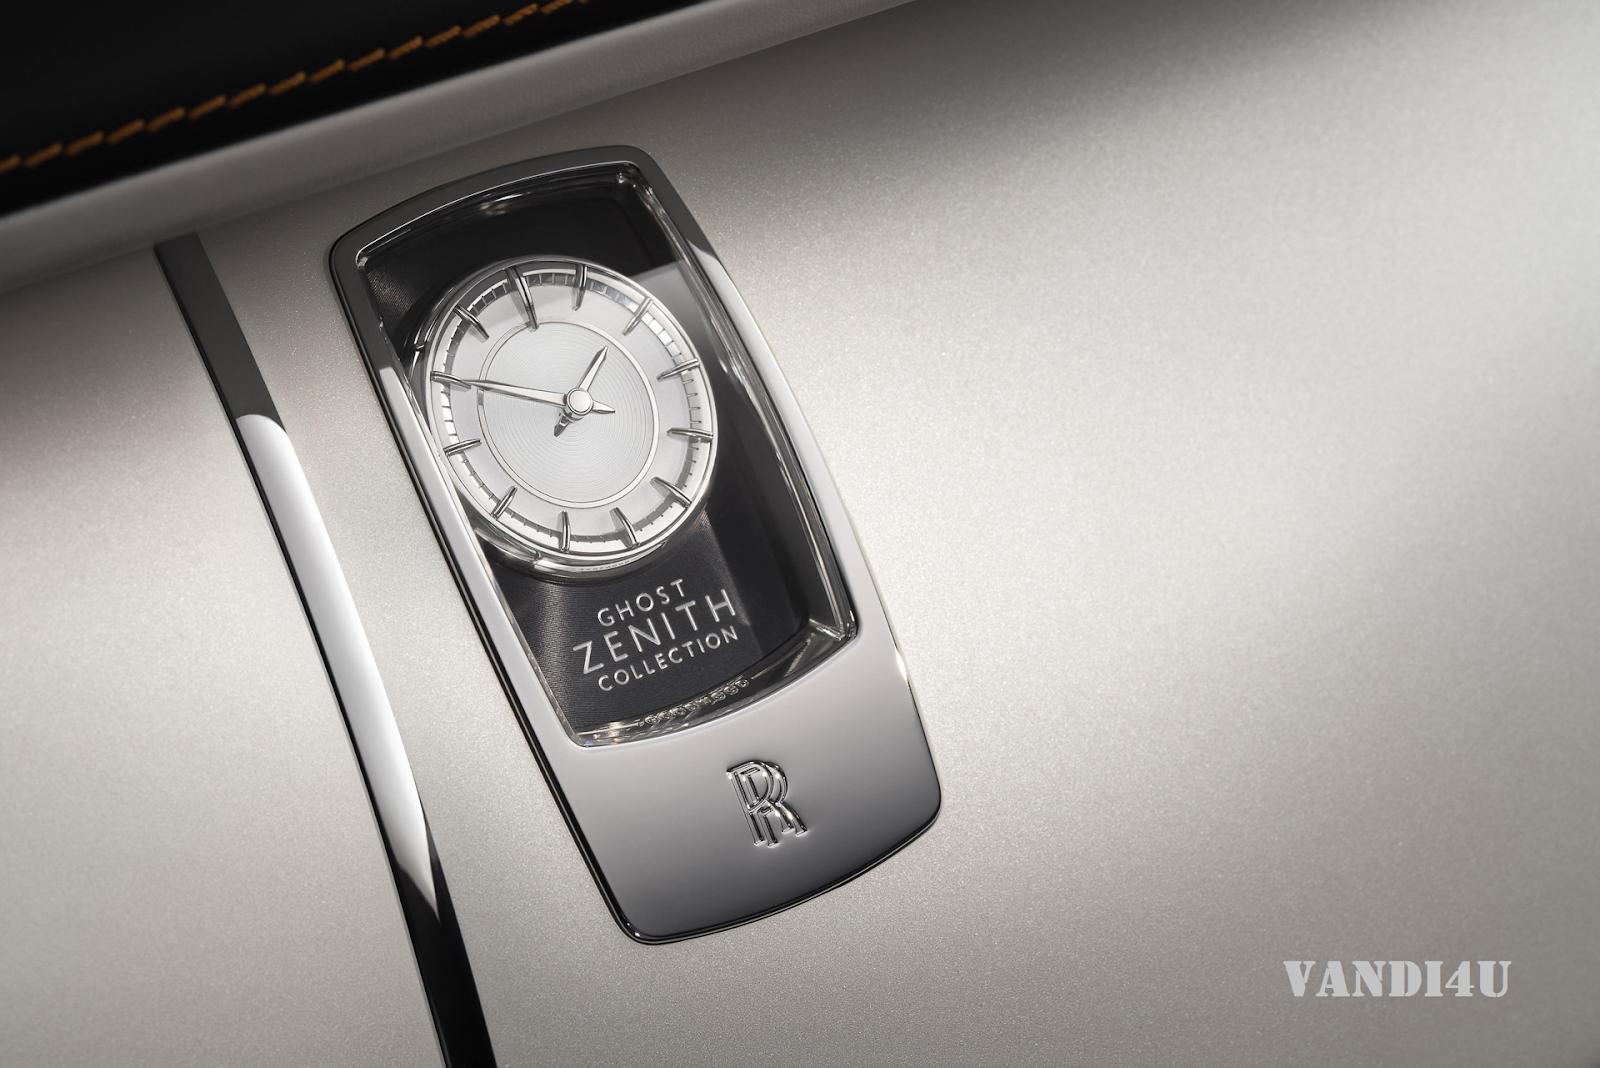 Rolls Royce Bids Farewell To Ghost With Zenith Collection   VANDI4U